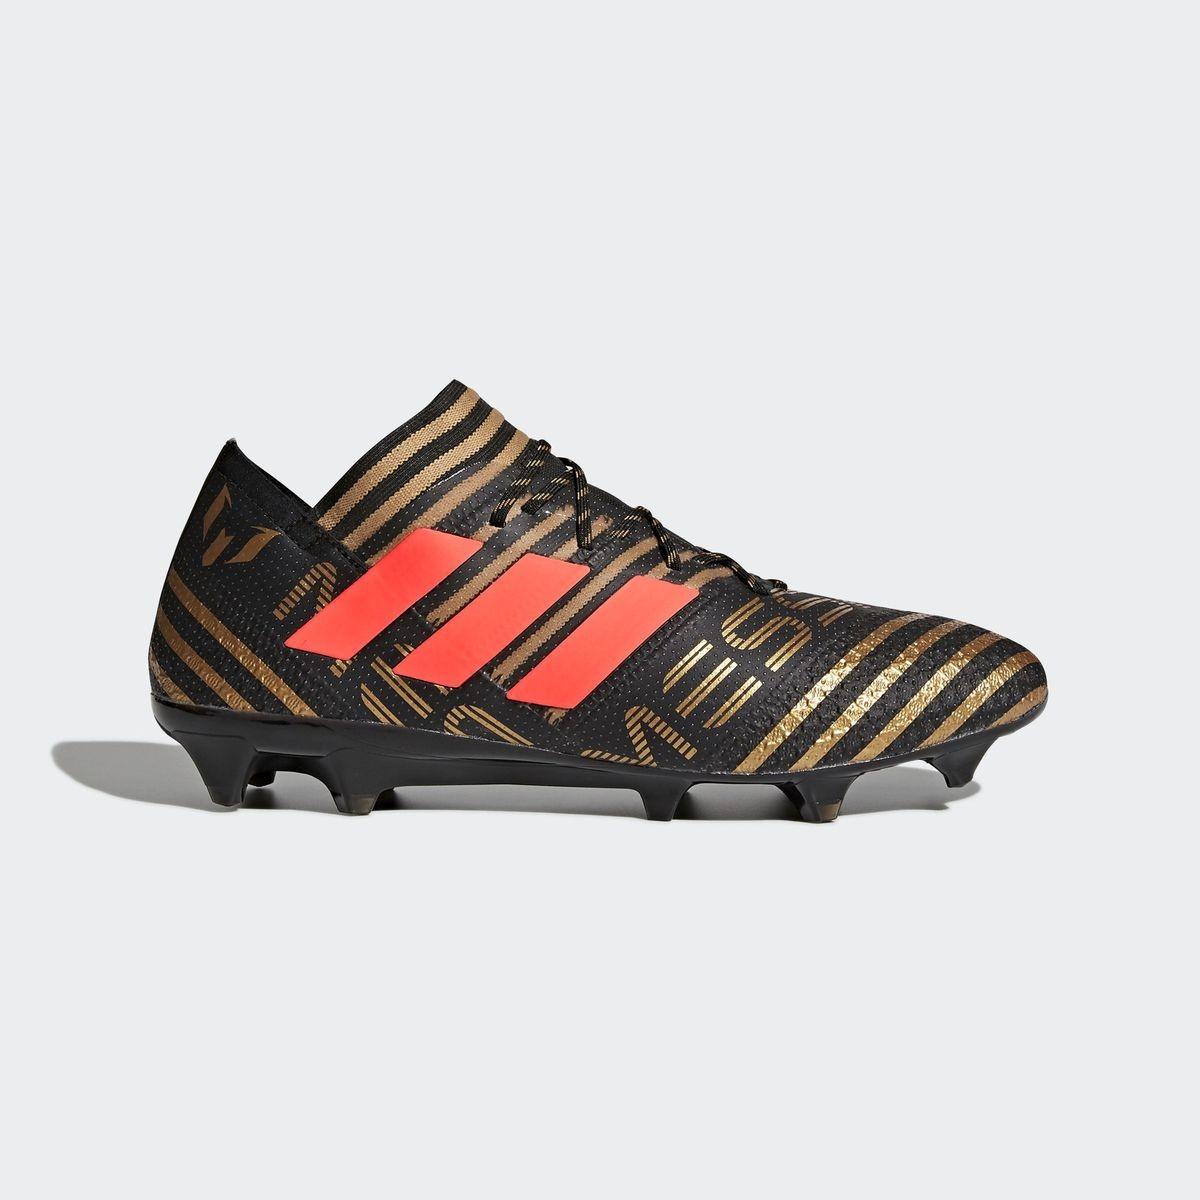 Chaussure Terrain Taille42;42 17 Souple Messi 23;43 1 Nemeziz otQBhrdCsx